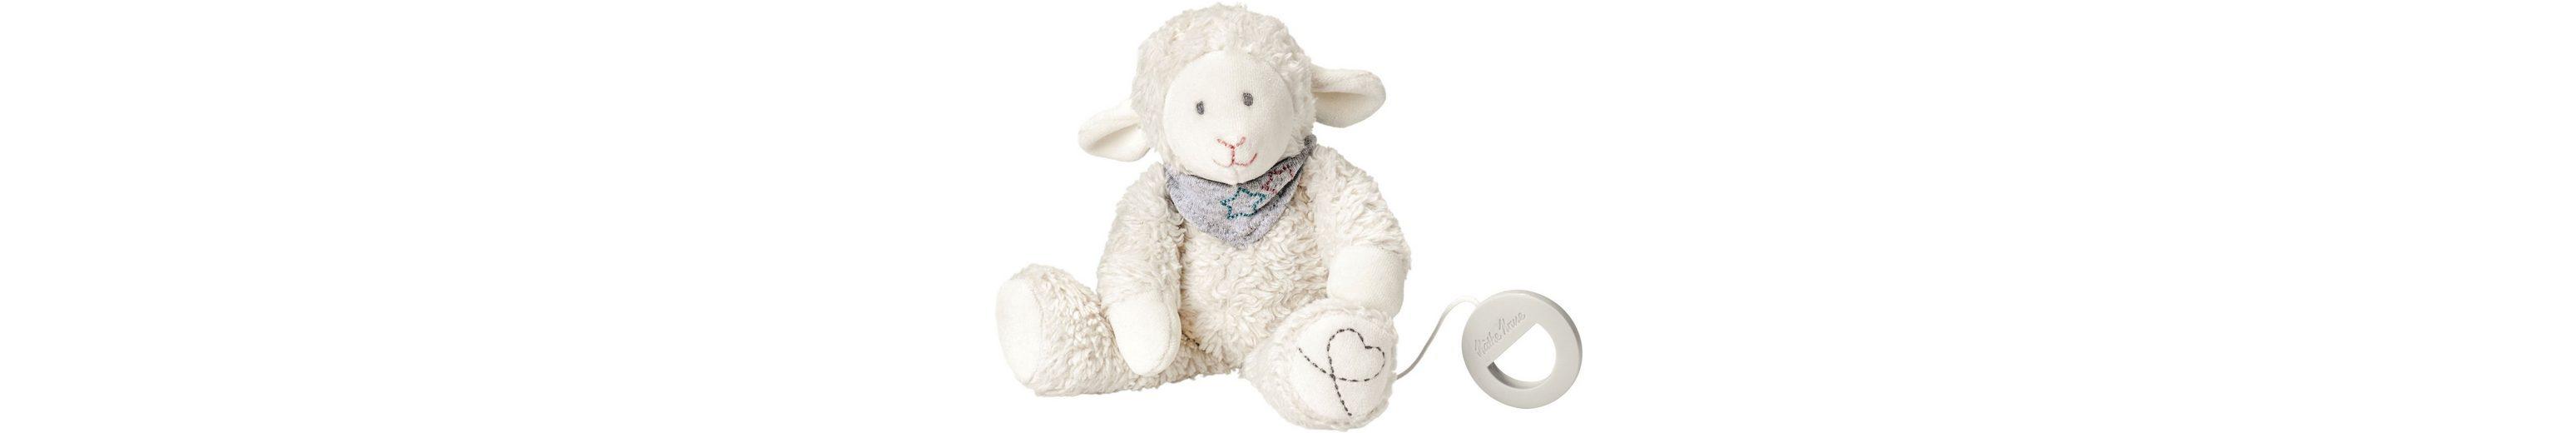 Käthe Kruse Stofftier mit Musik, »Lamm Mojo Spieluhr«